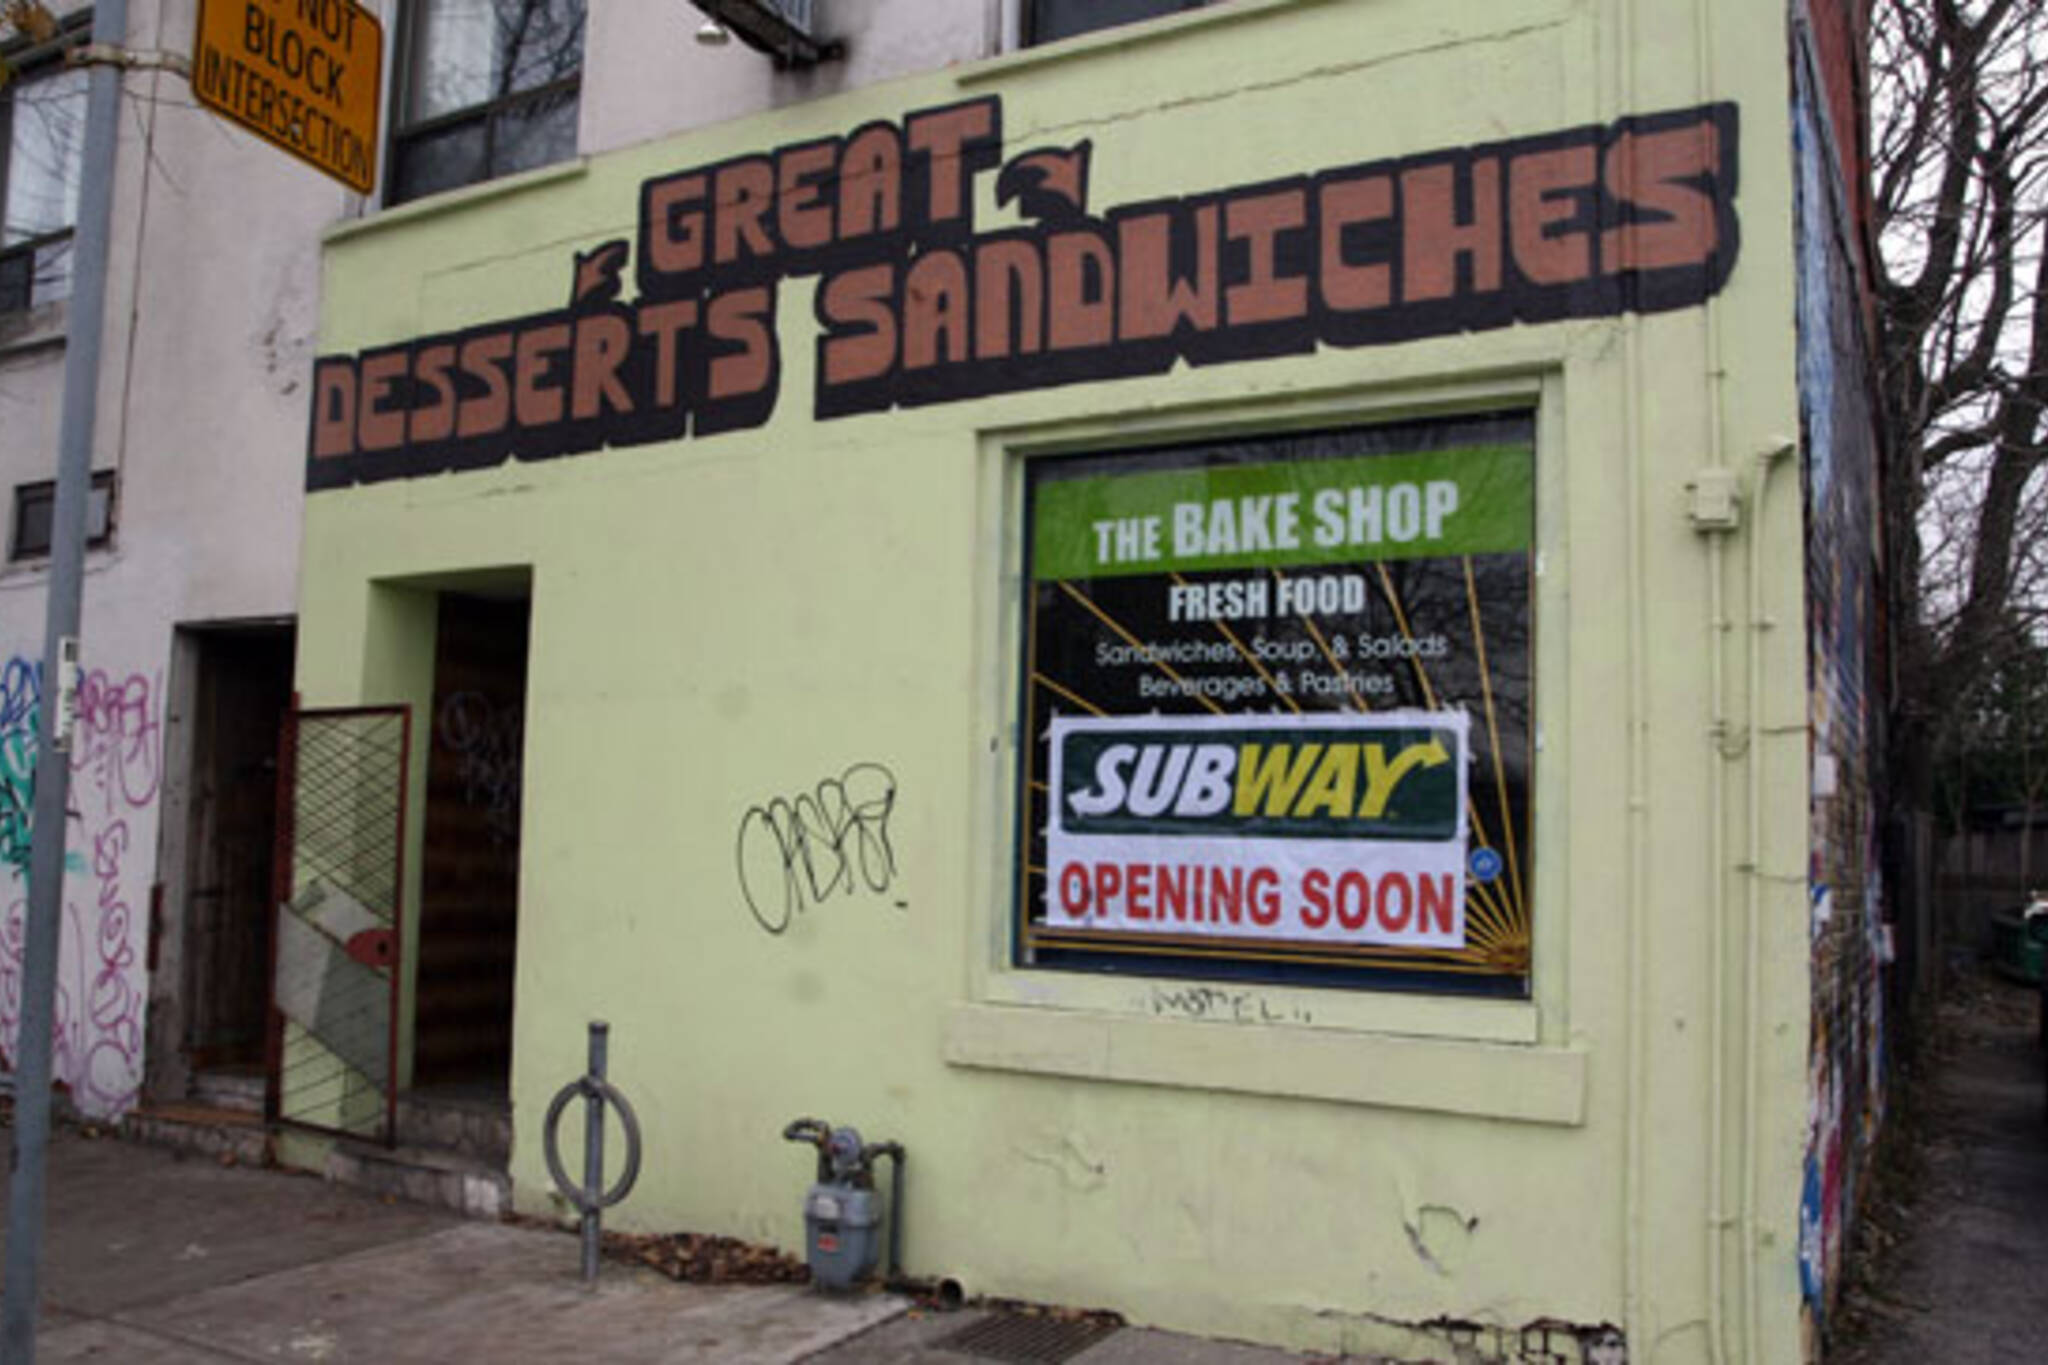 Subway Harbord